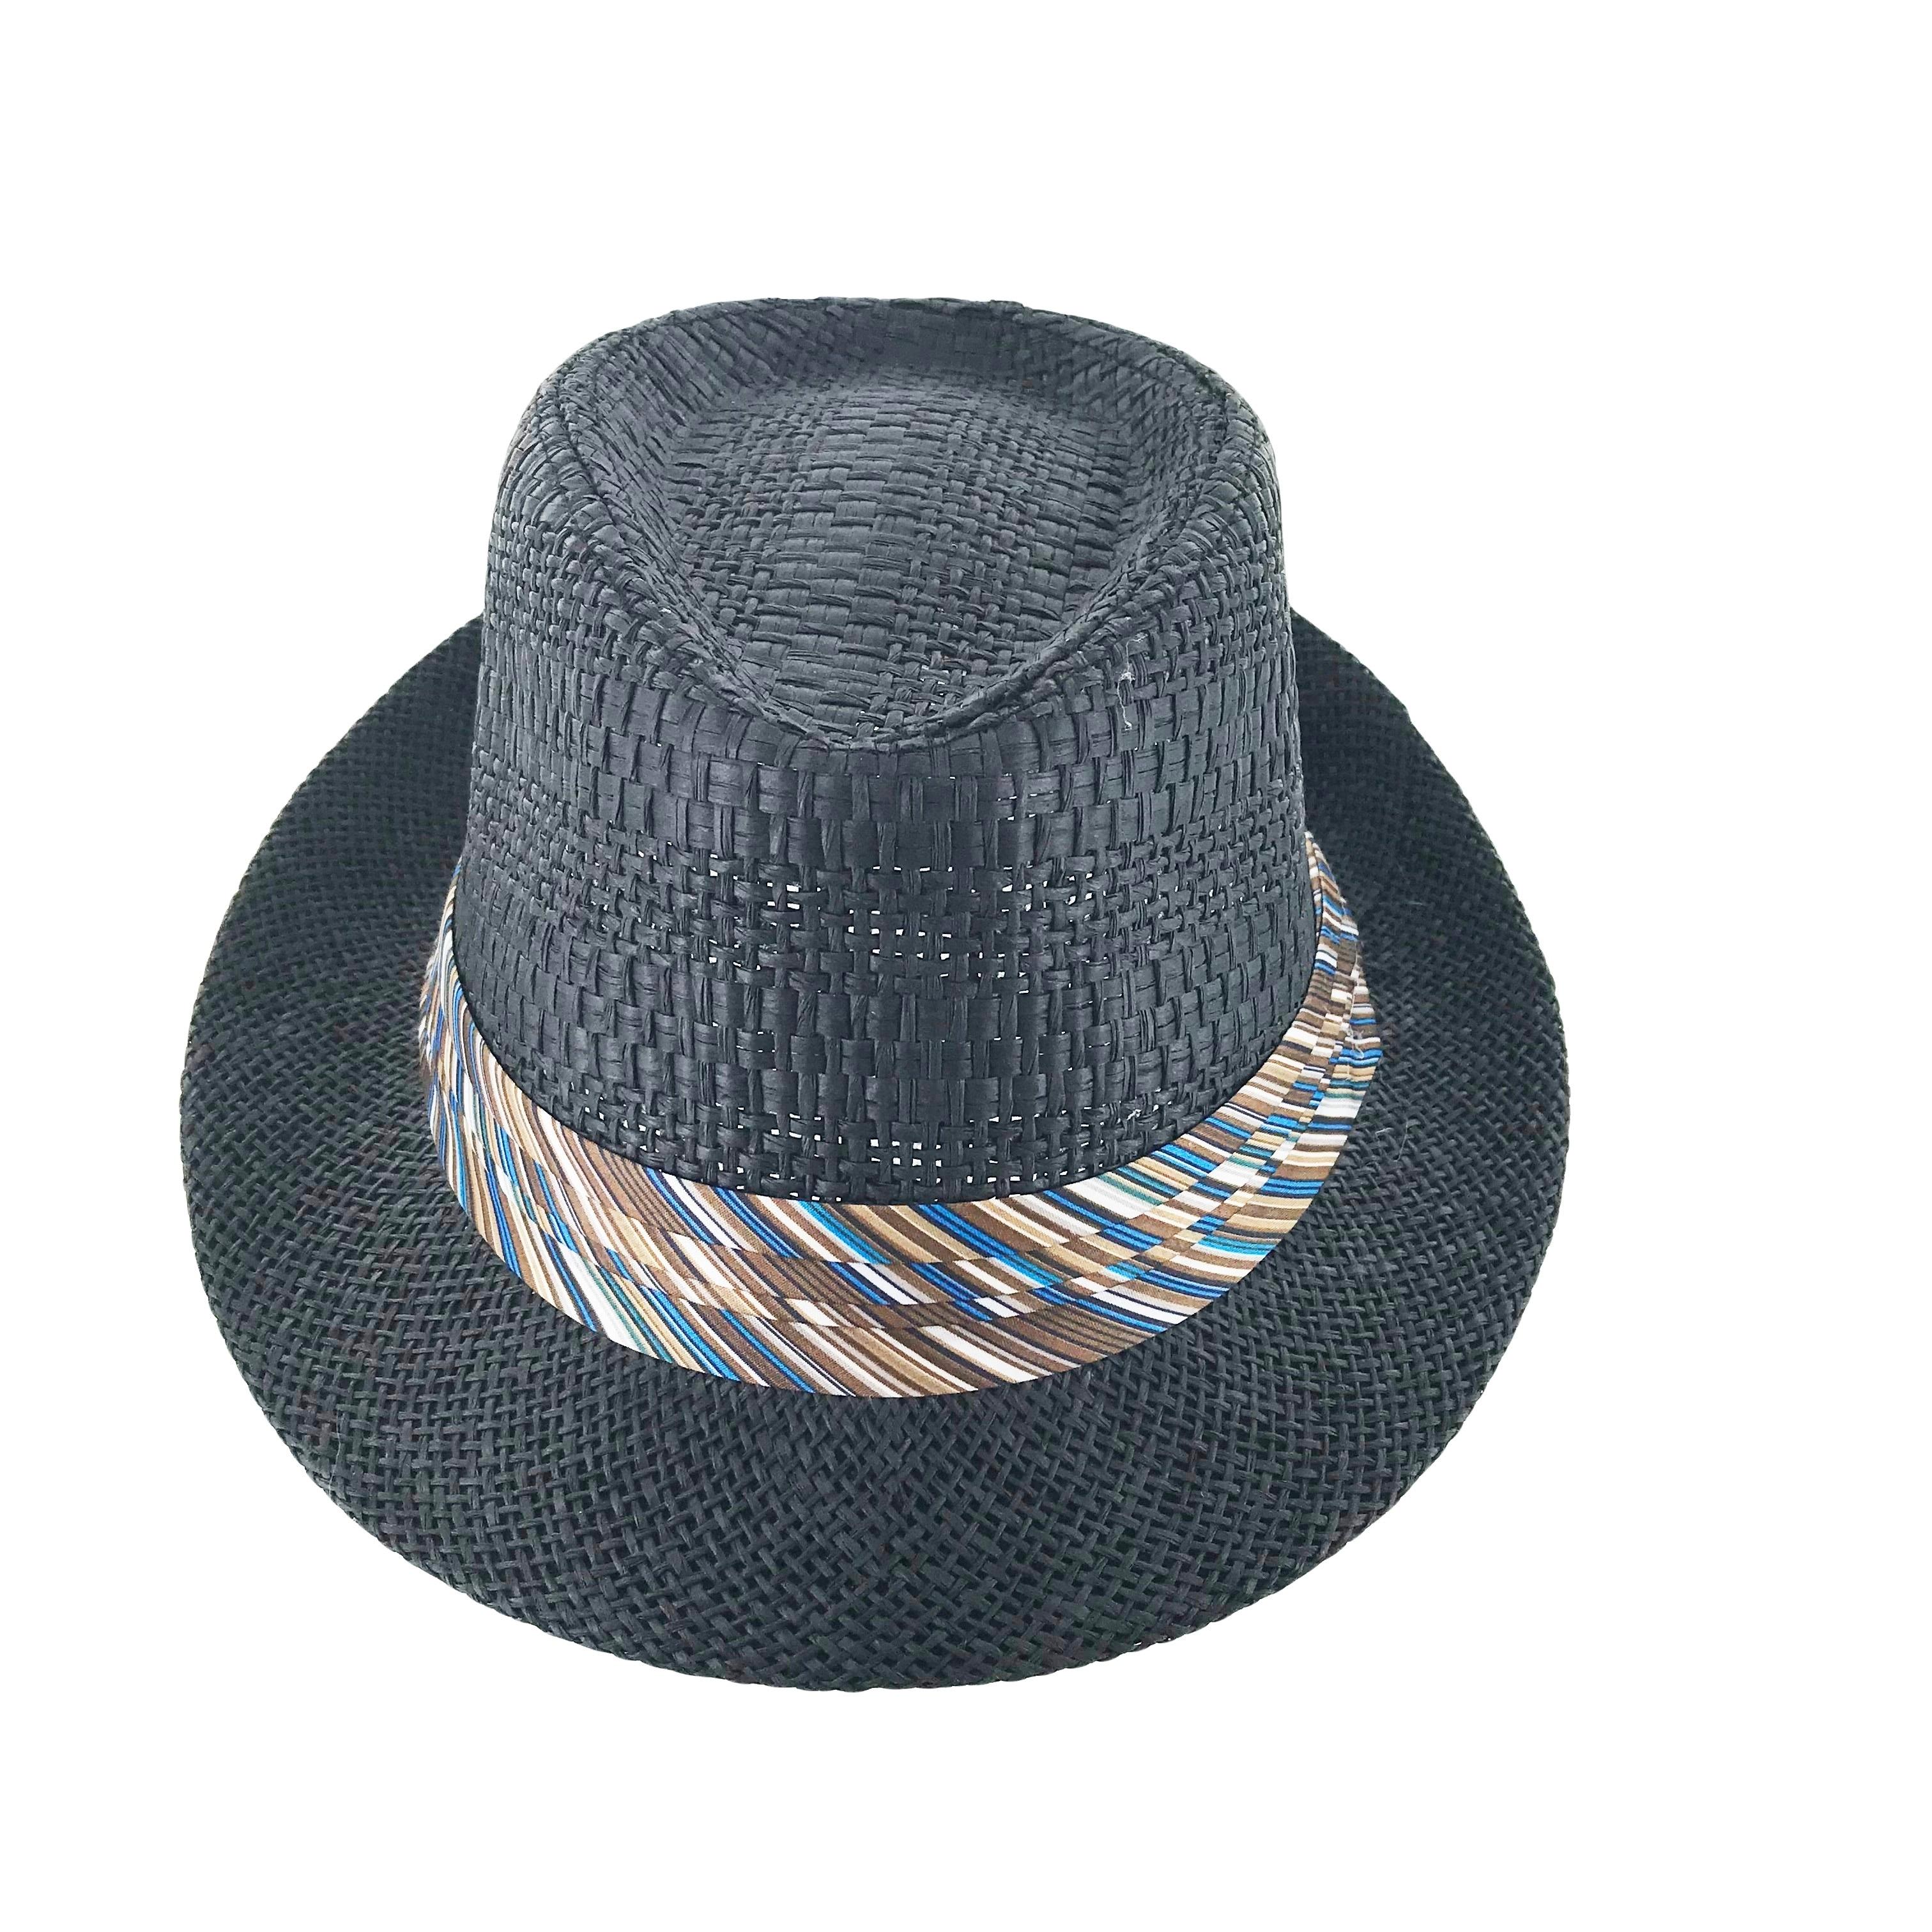 ea7b88df101 Shop Faddism Festiva Cuban Style Short Brim Fedora Straw Hat - Free  Shipping On Orders Over  45 - Overstock - 22492146